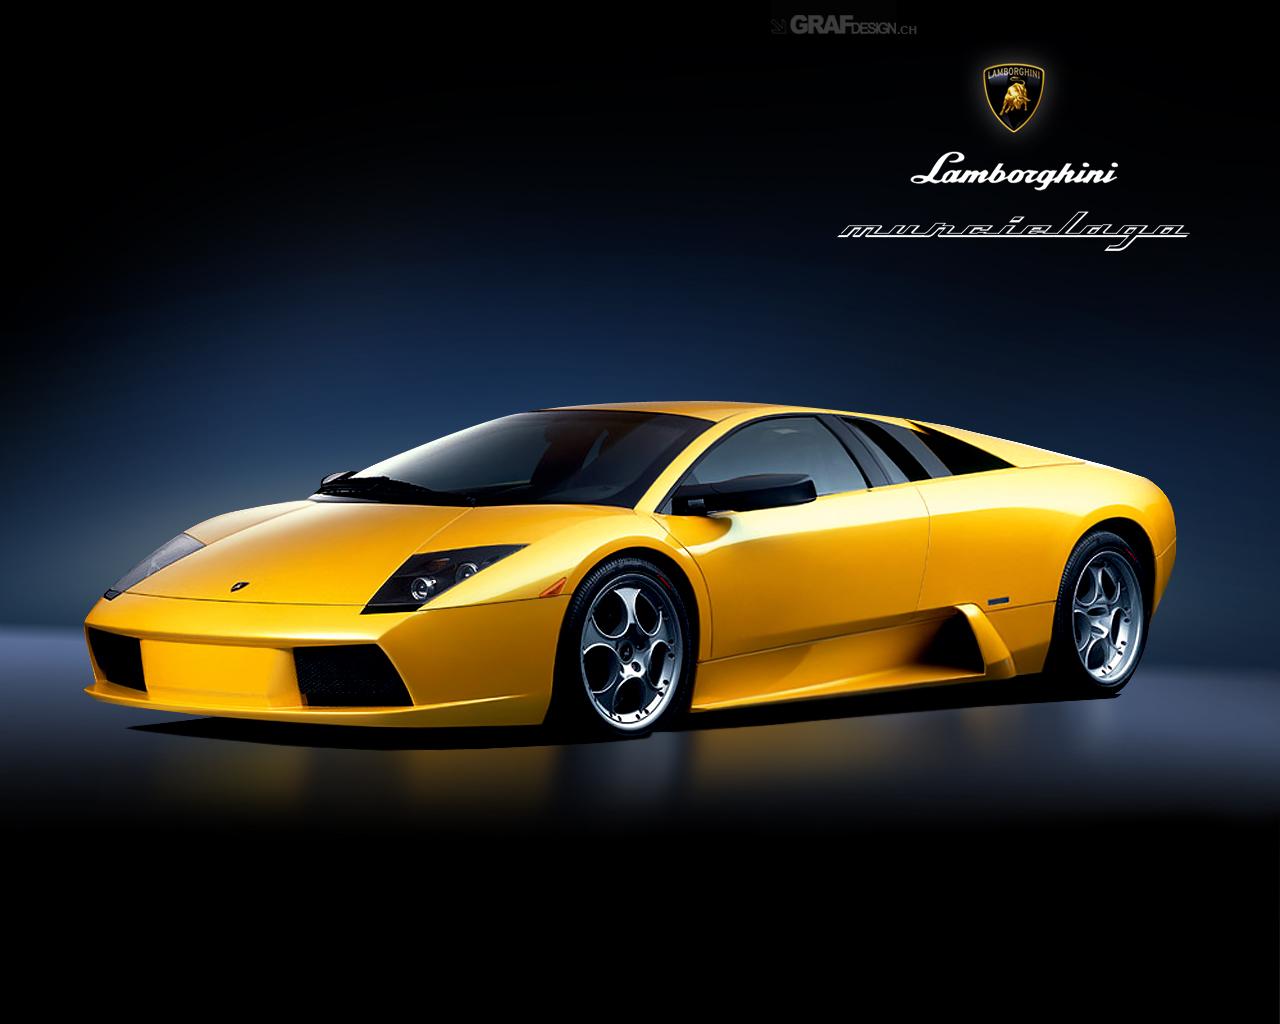 Yellow Lamborghini Murchi Wallpaper Desktop 1280x1024